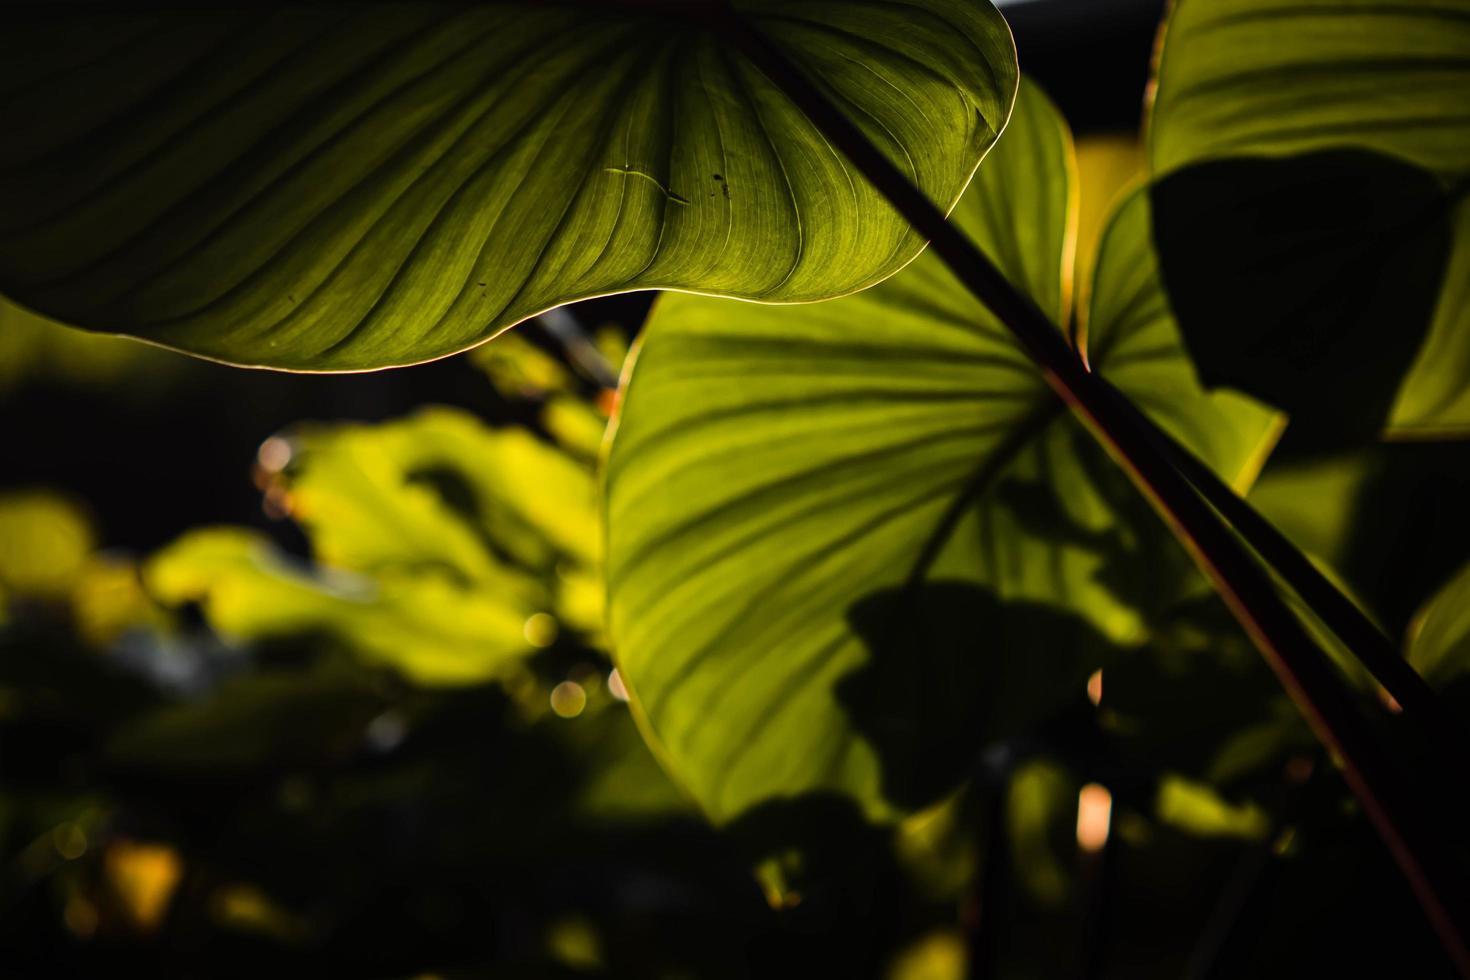 Cerrar hojas verdes de homalomena rubescen.sol a través de hojas verdes, primavera de la naturaleza. foto